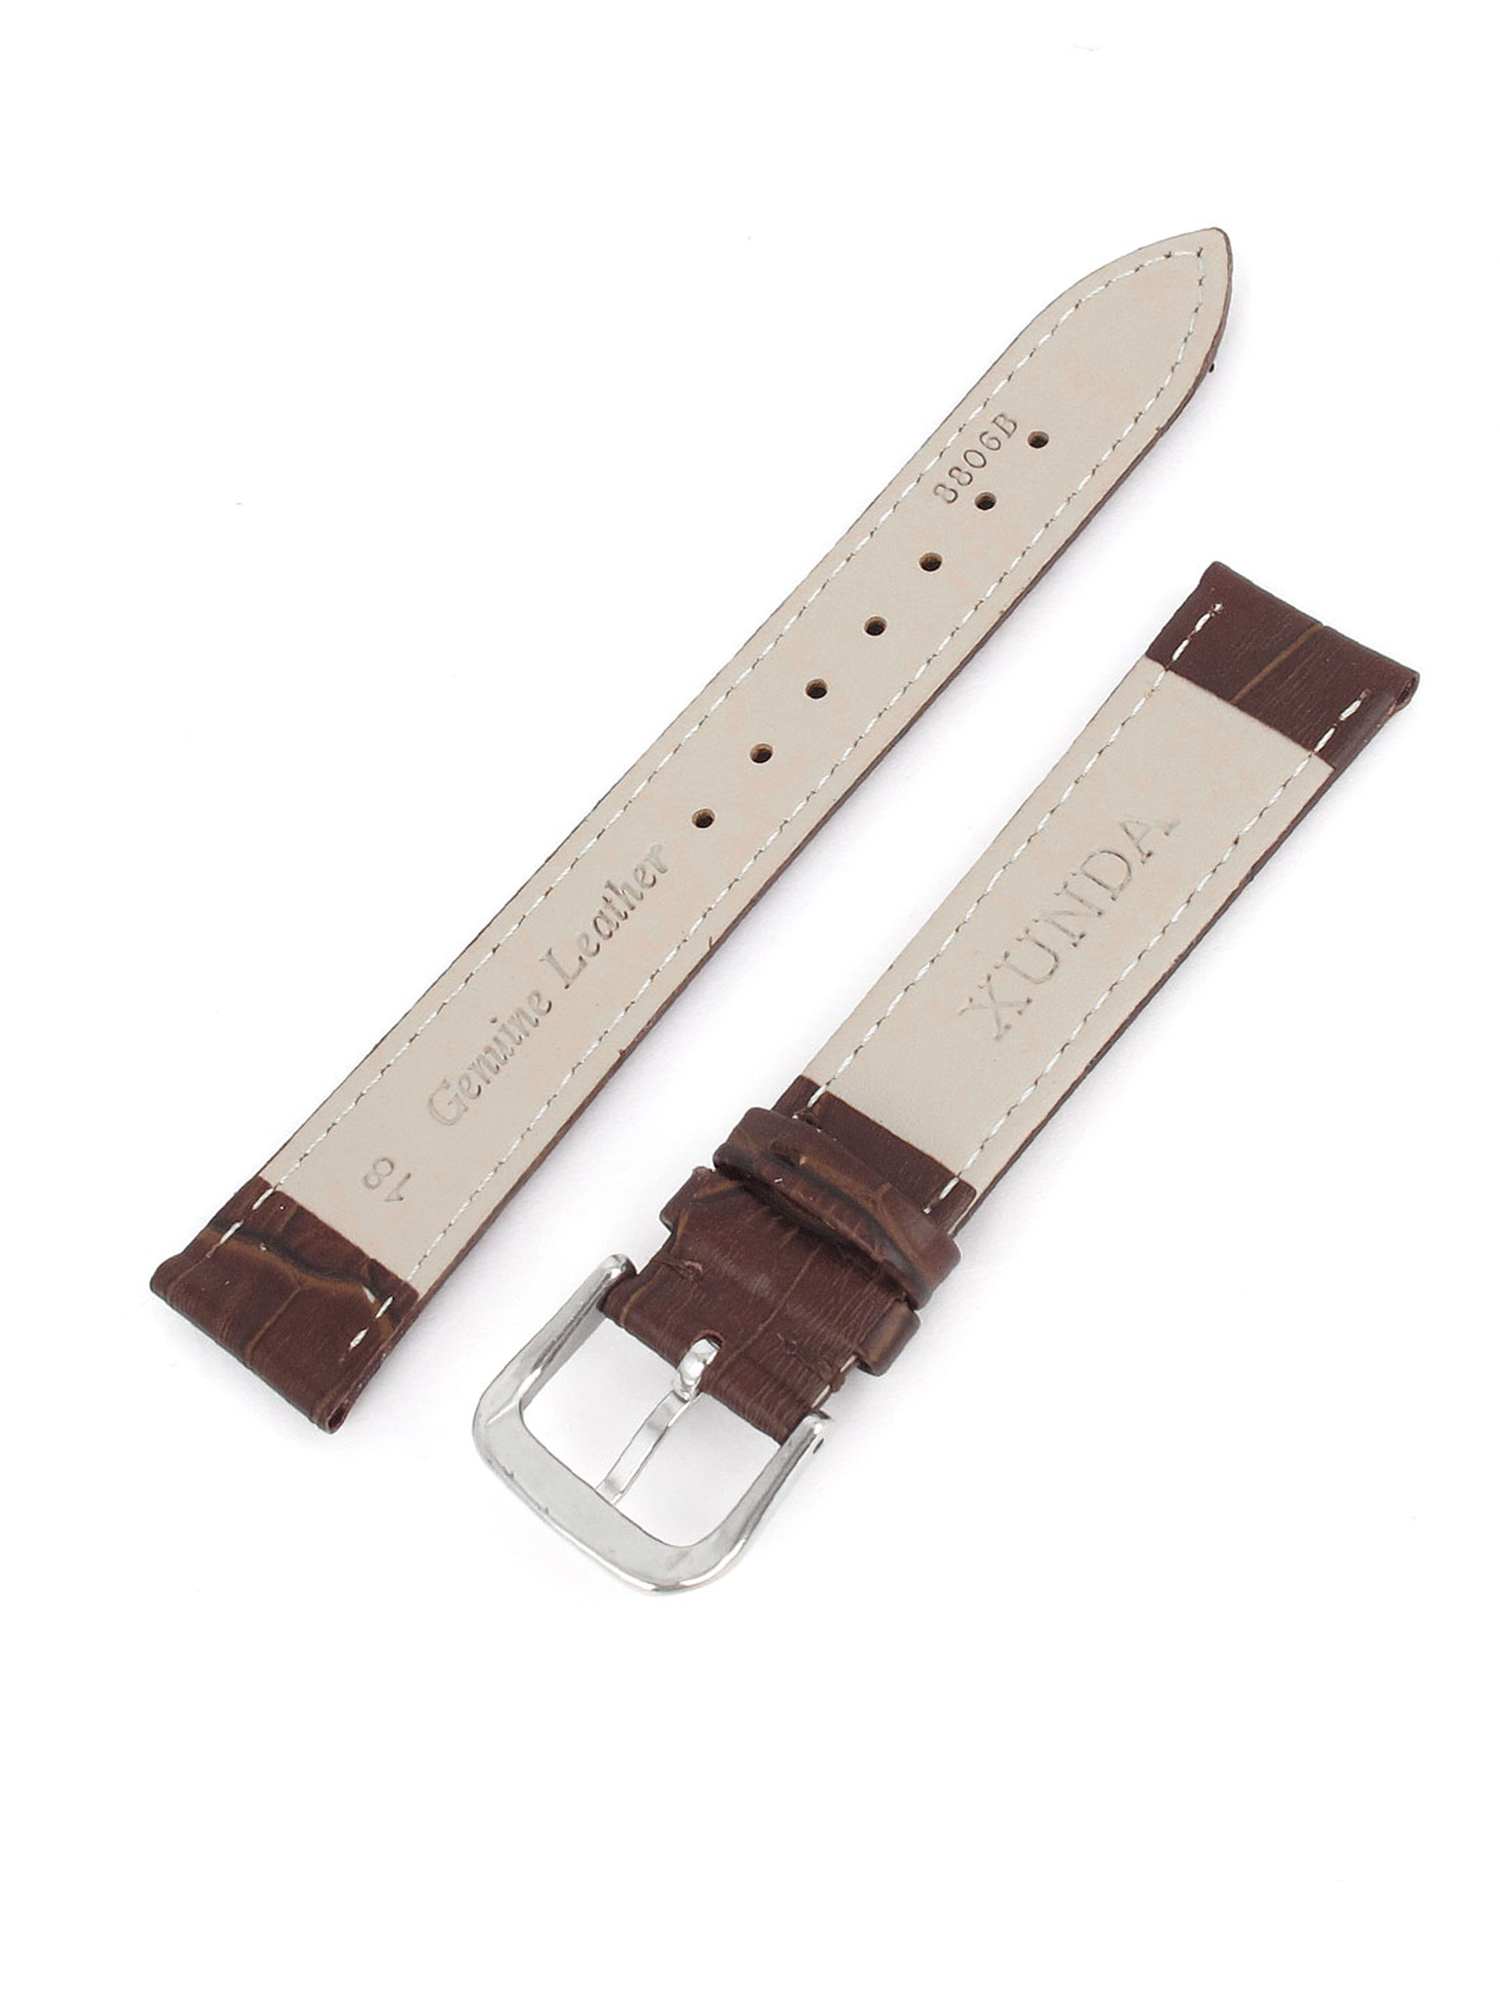 Alligator Grain WristWatch Band Genuine Leather Strap Silver /& Gold Buckle